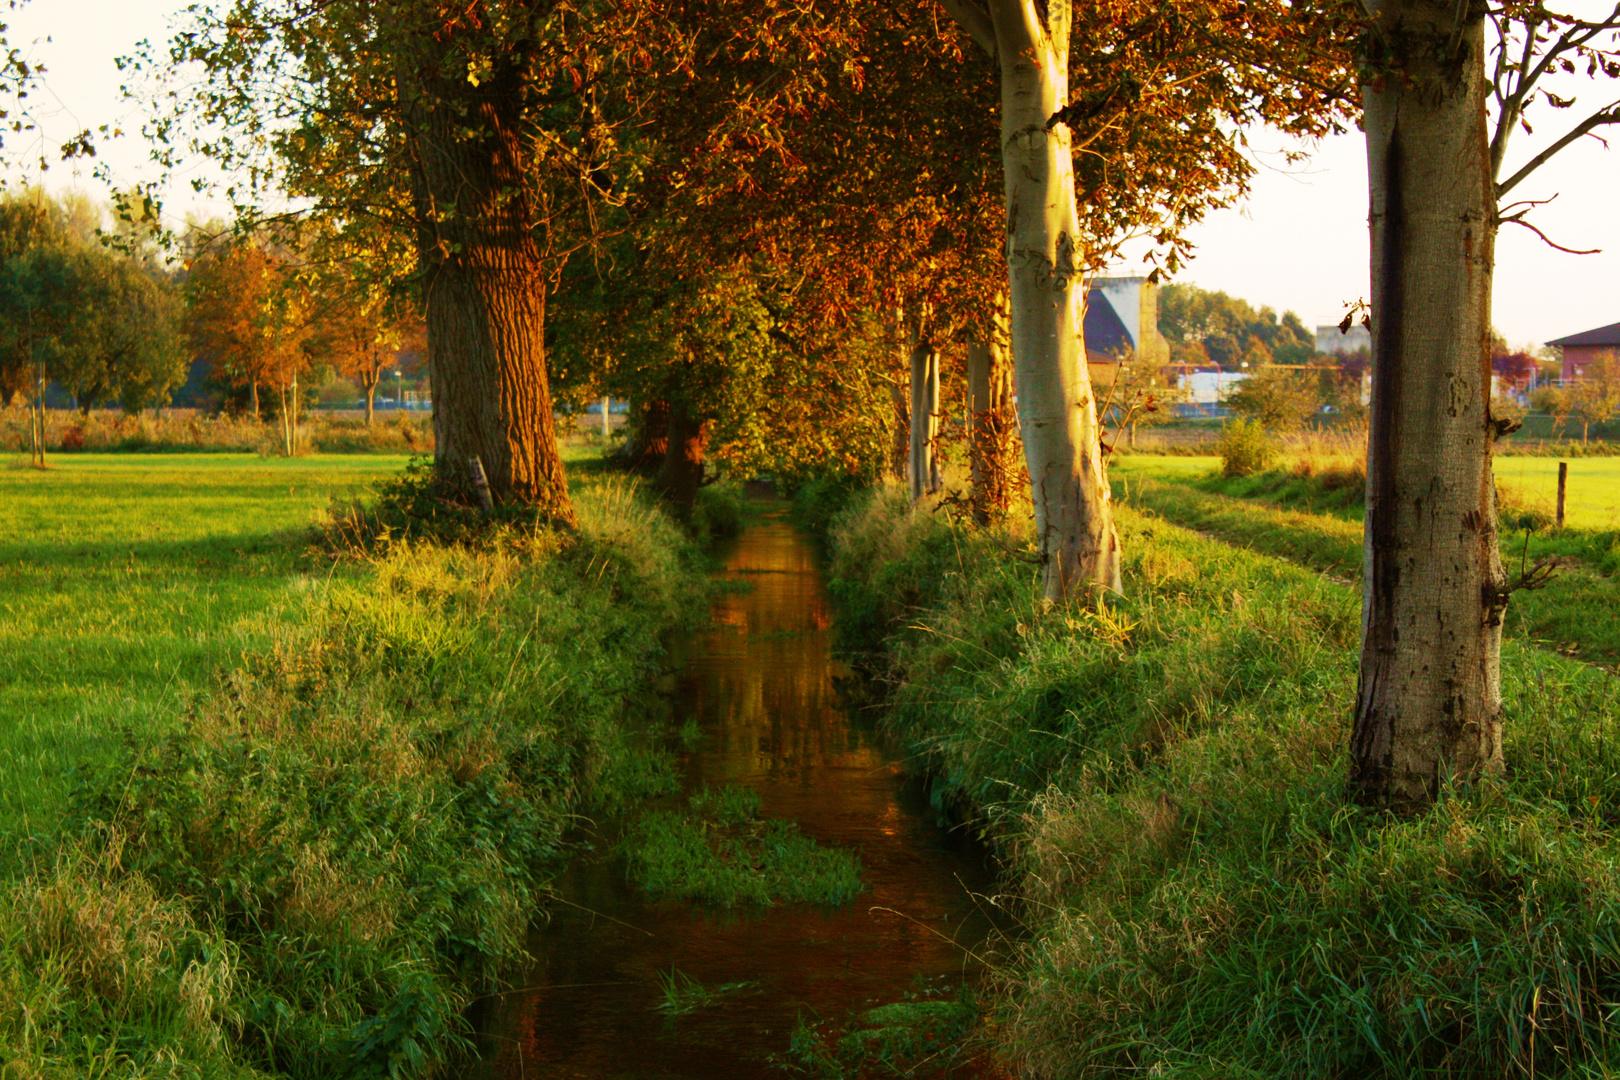 Herbst in Kirchhoven